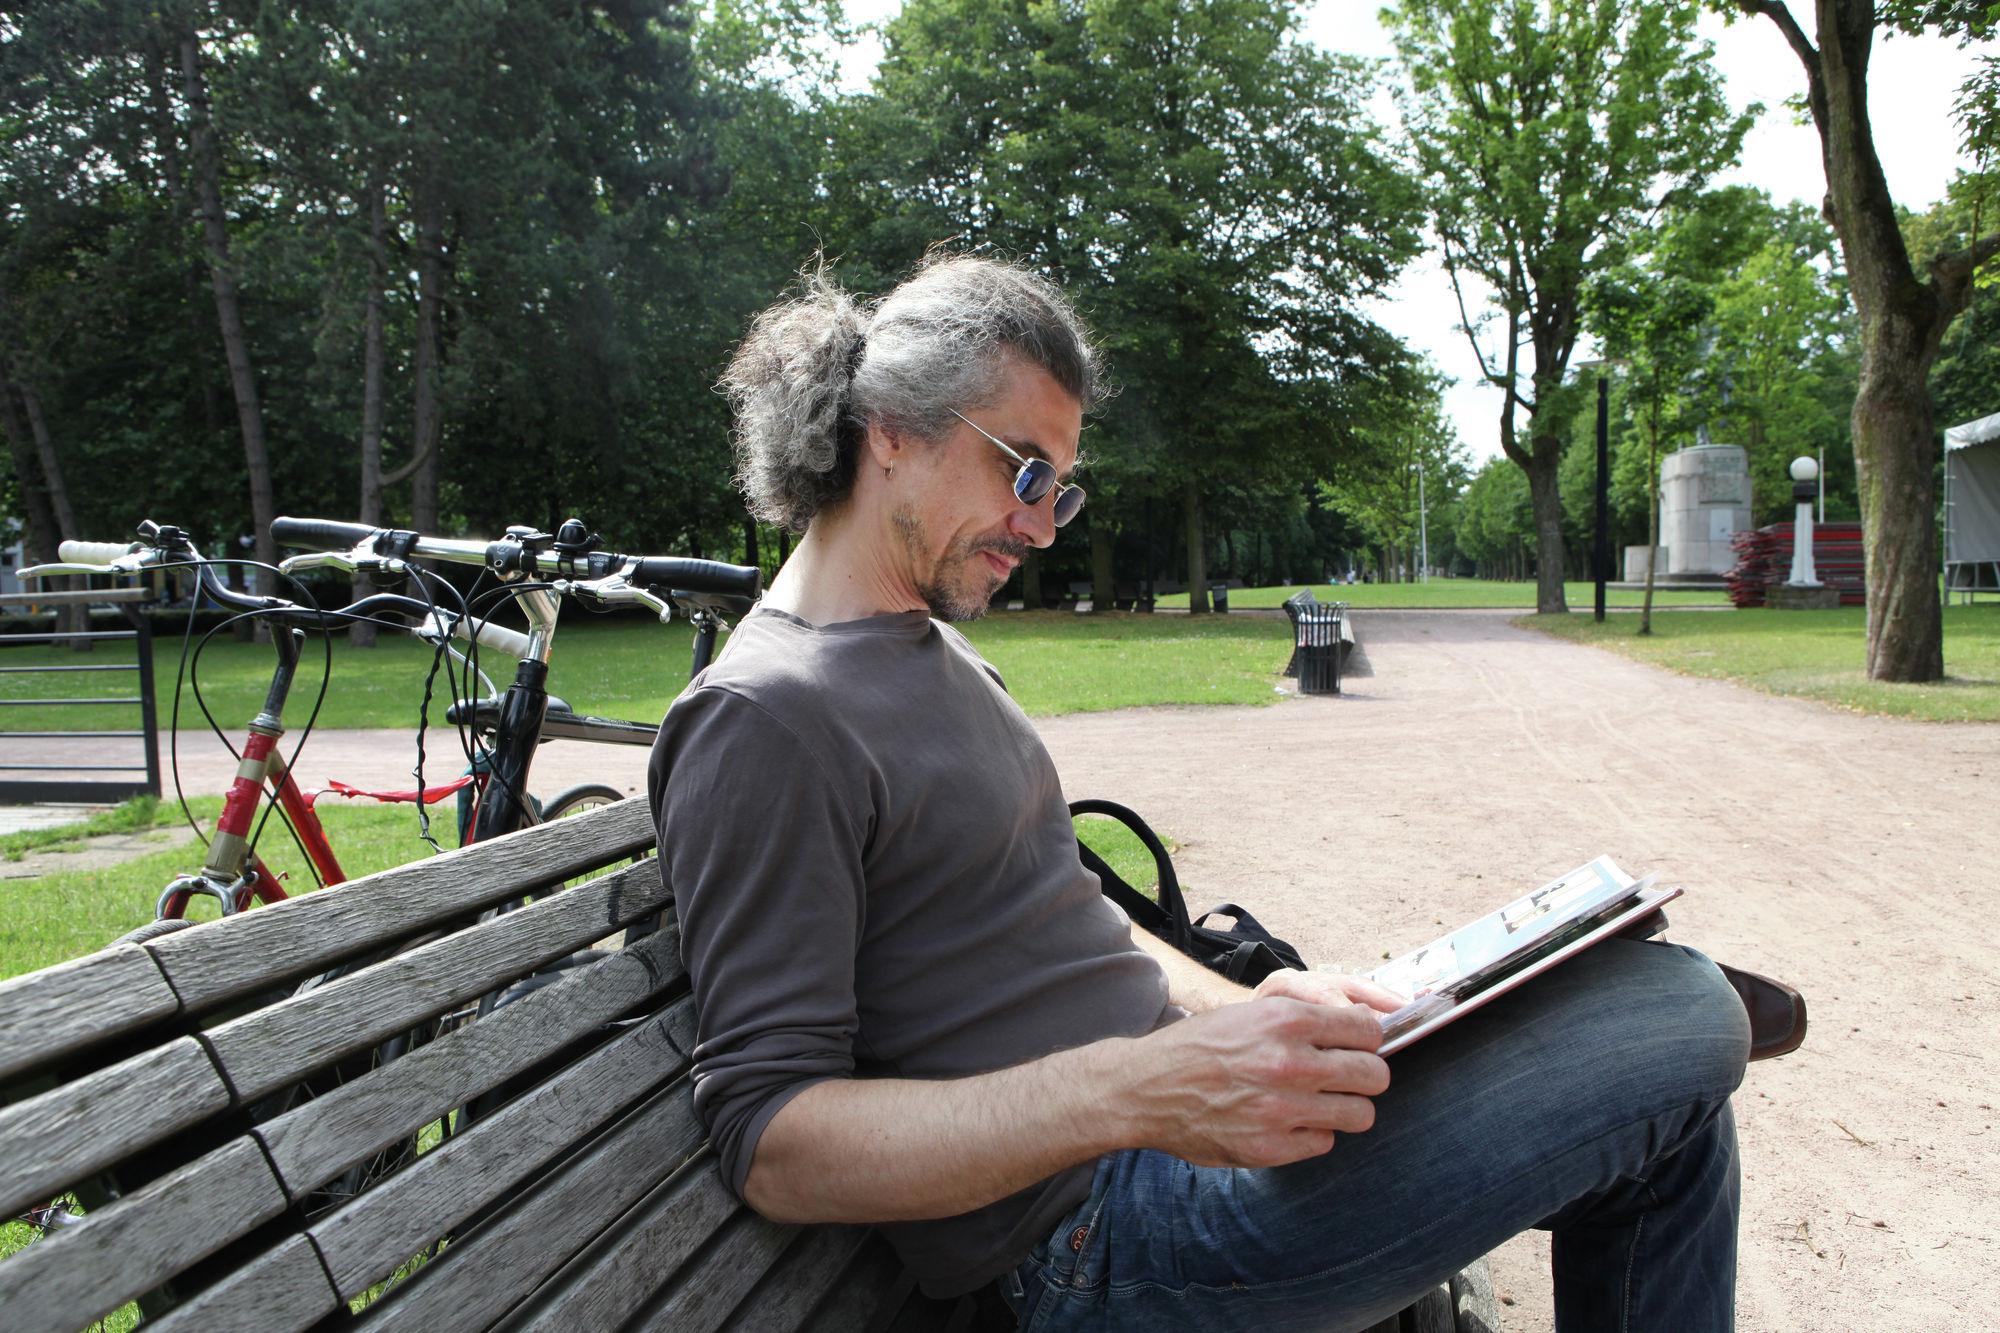 koning albertpark (16)©Layla Aerts.jpg